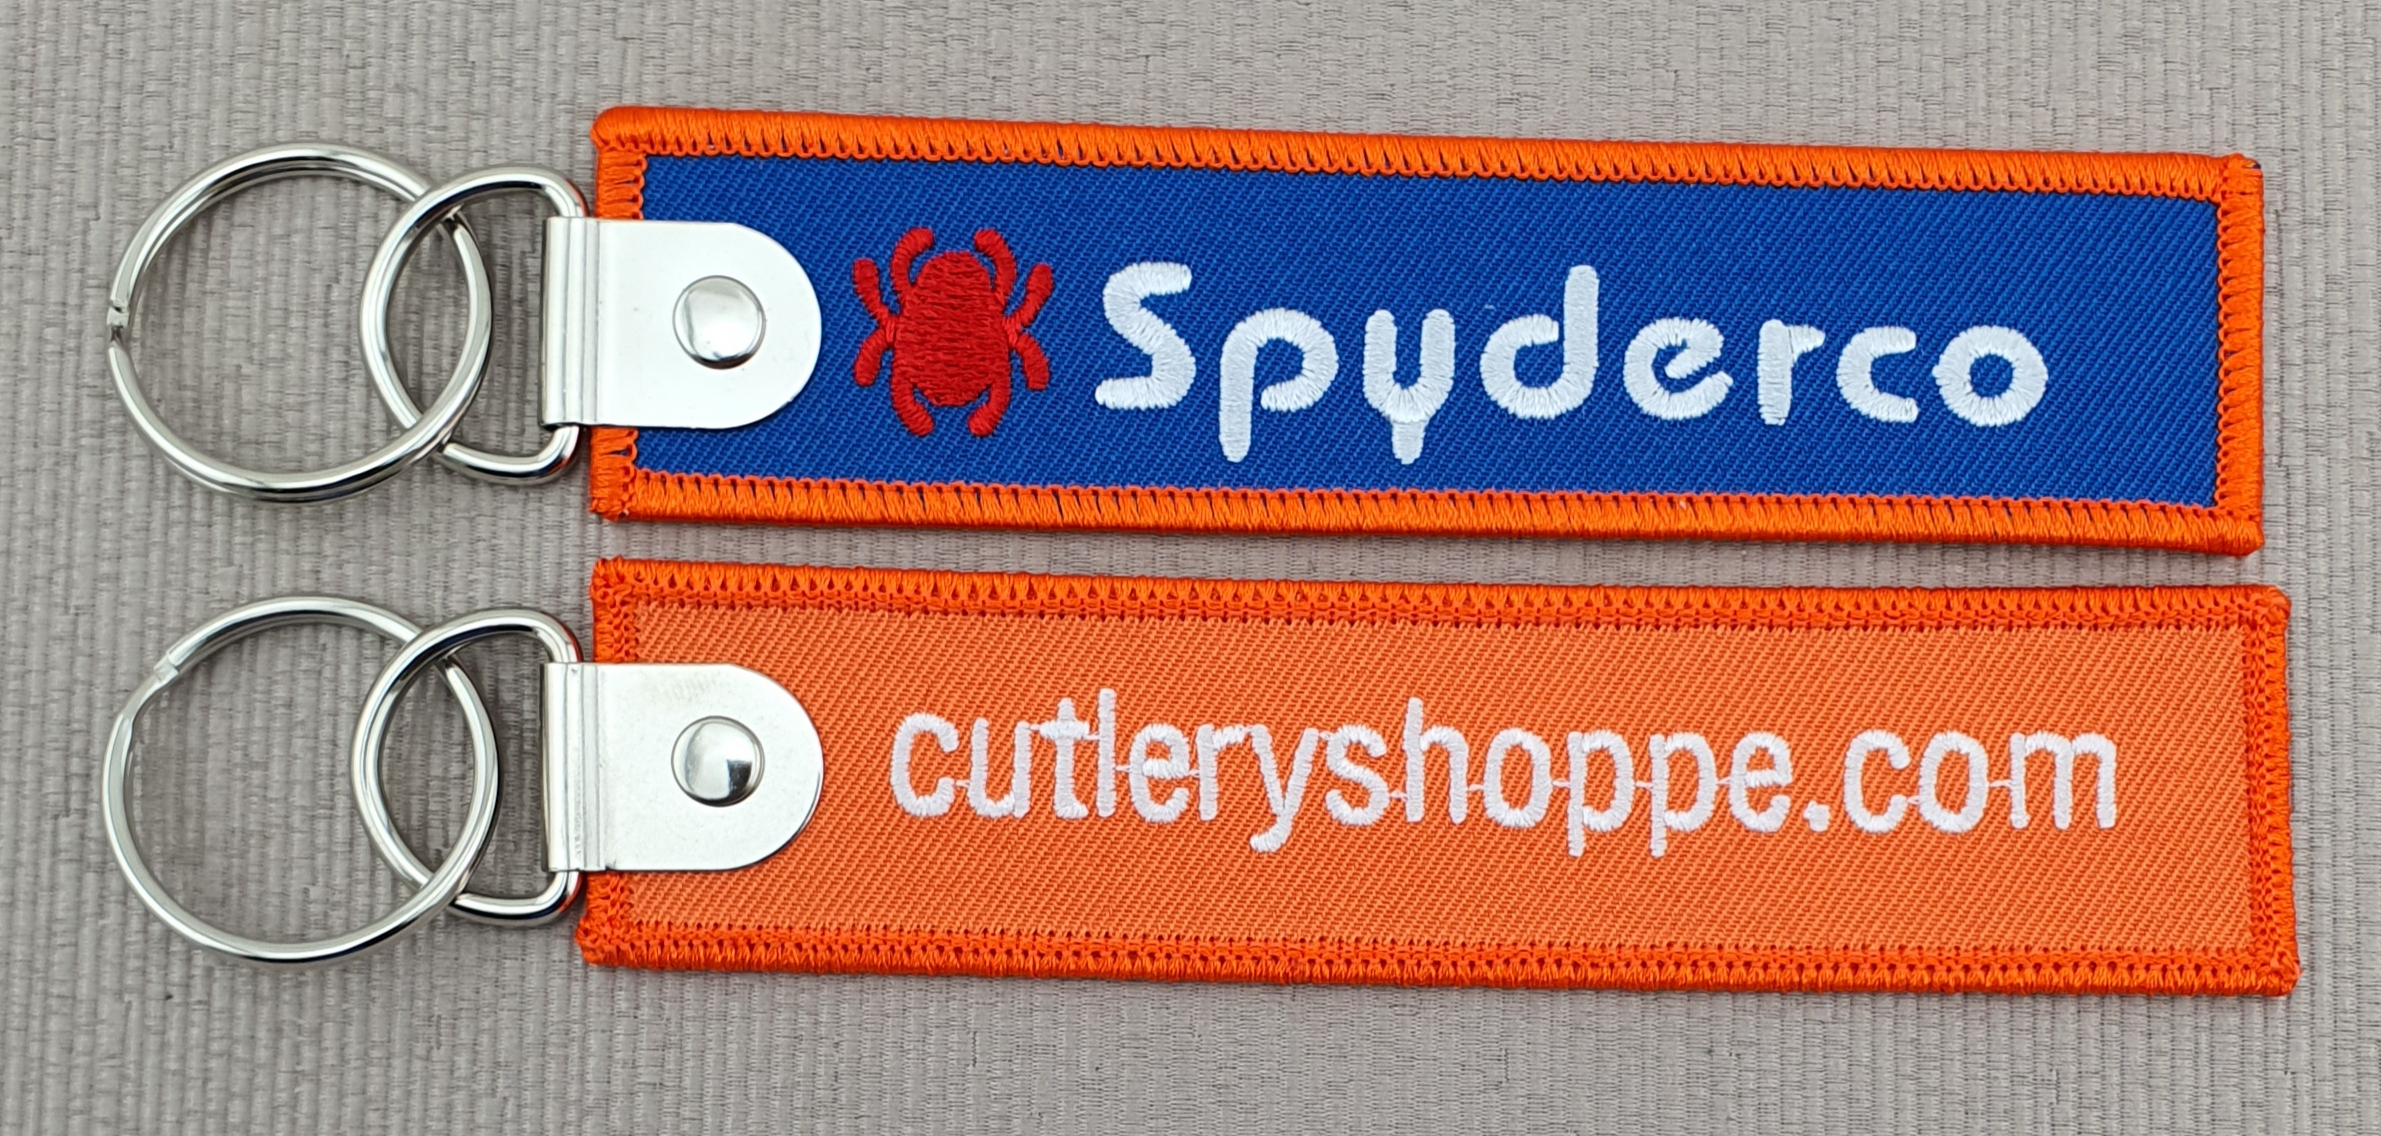 Spyderco tag